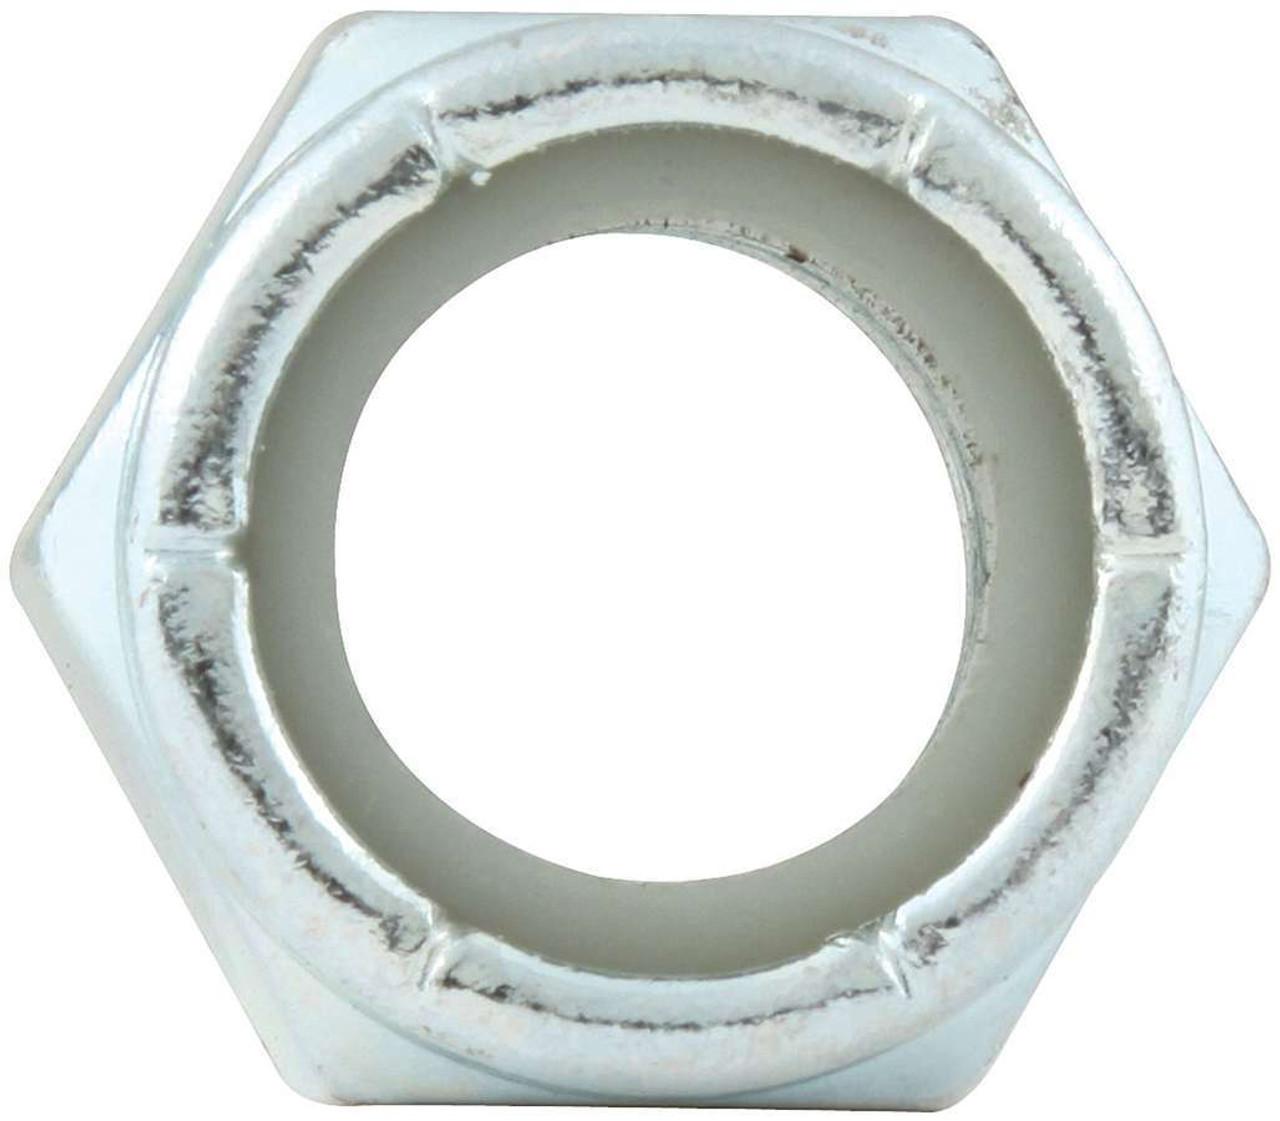 Pack of 10 Allstar ALL16065-10 Fine Thread Hex Nut with Nylon Insert,